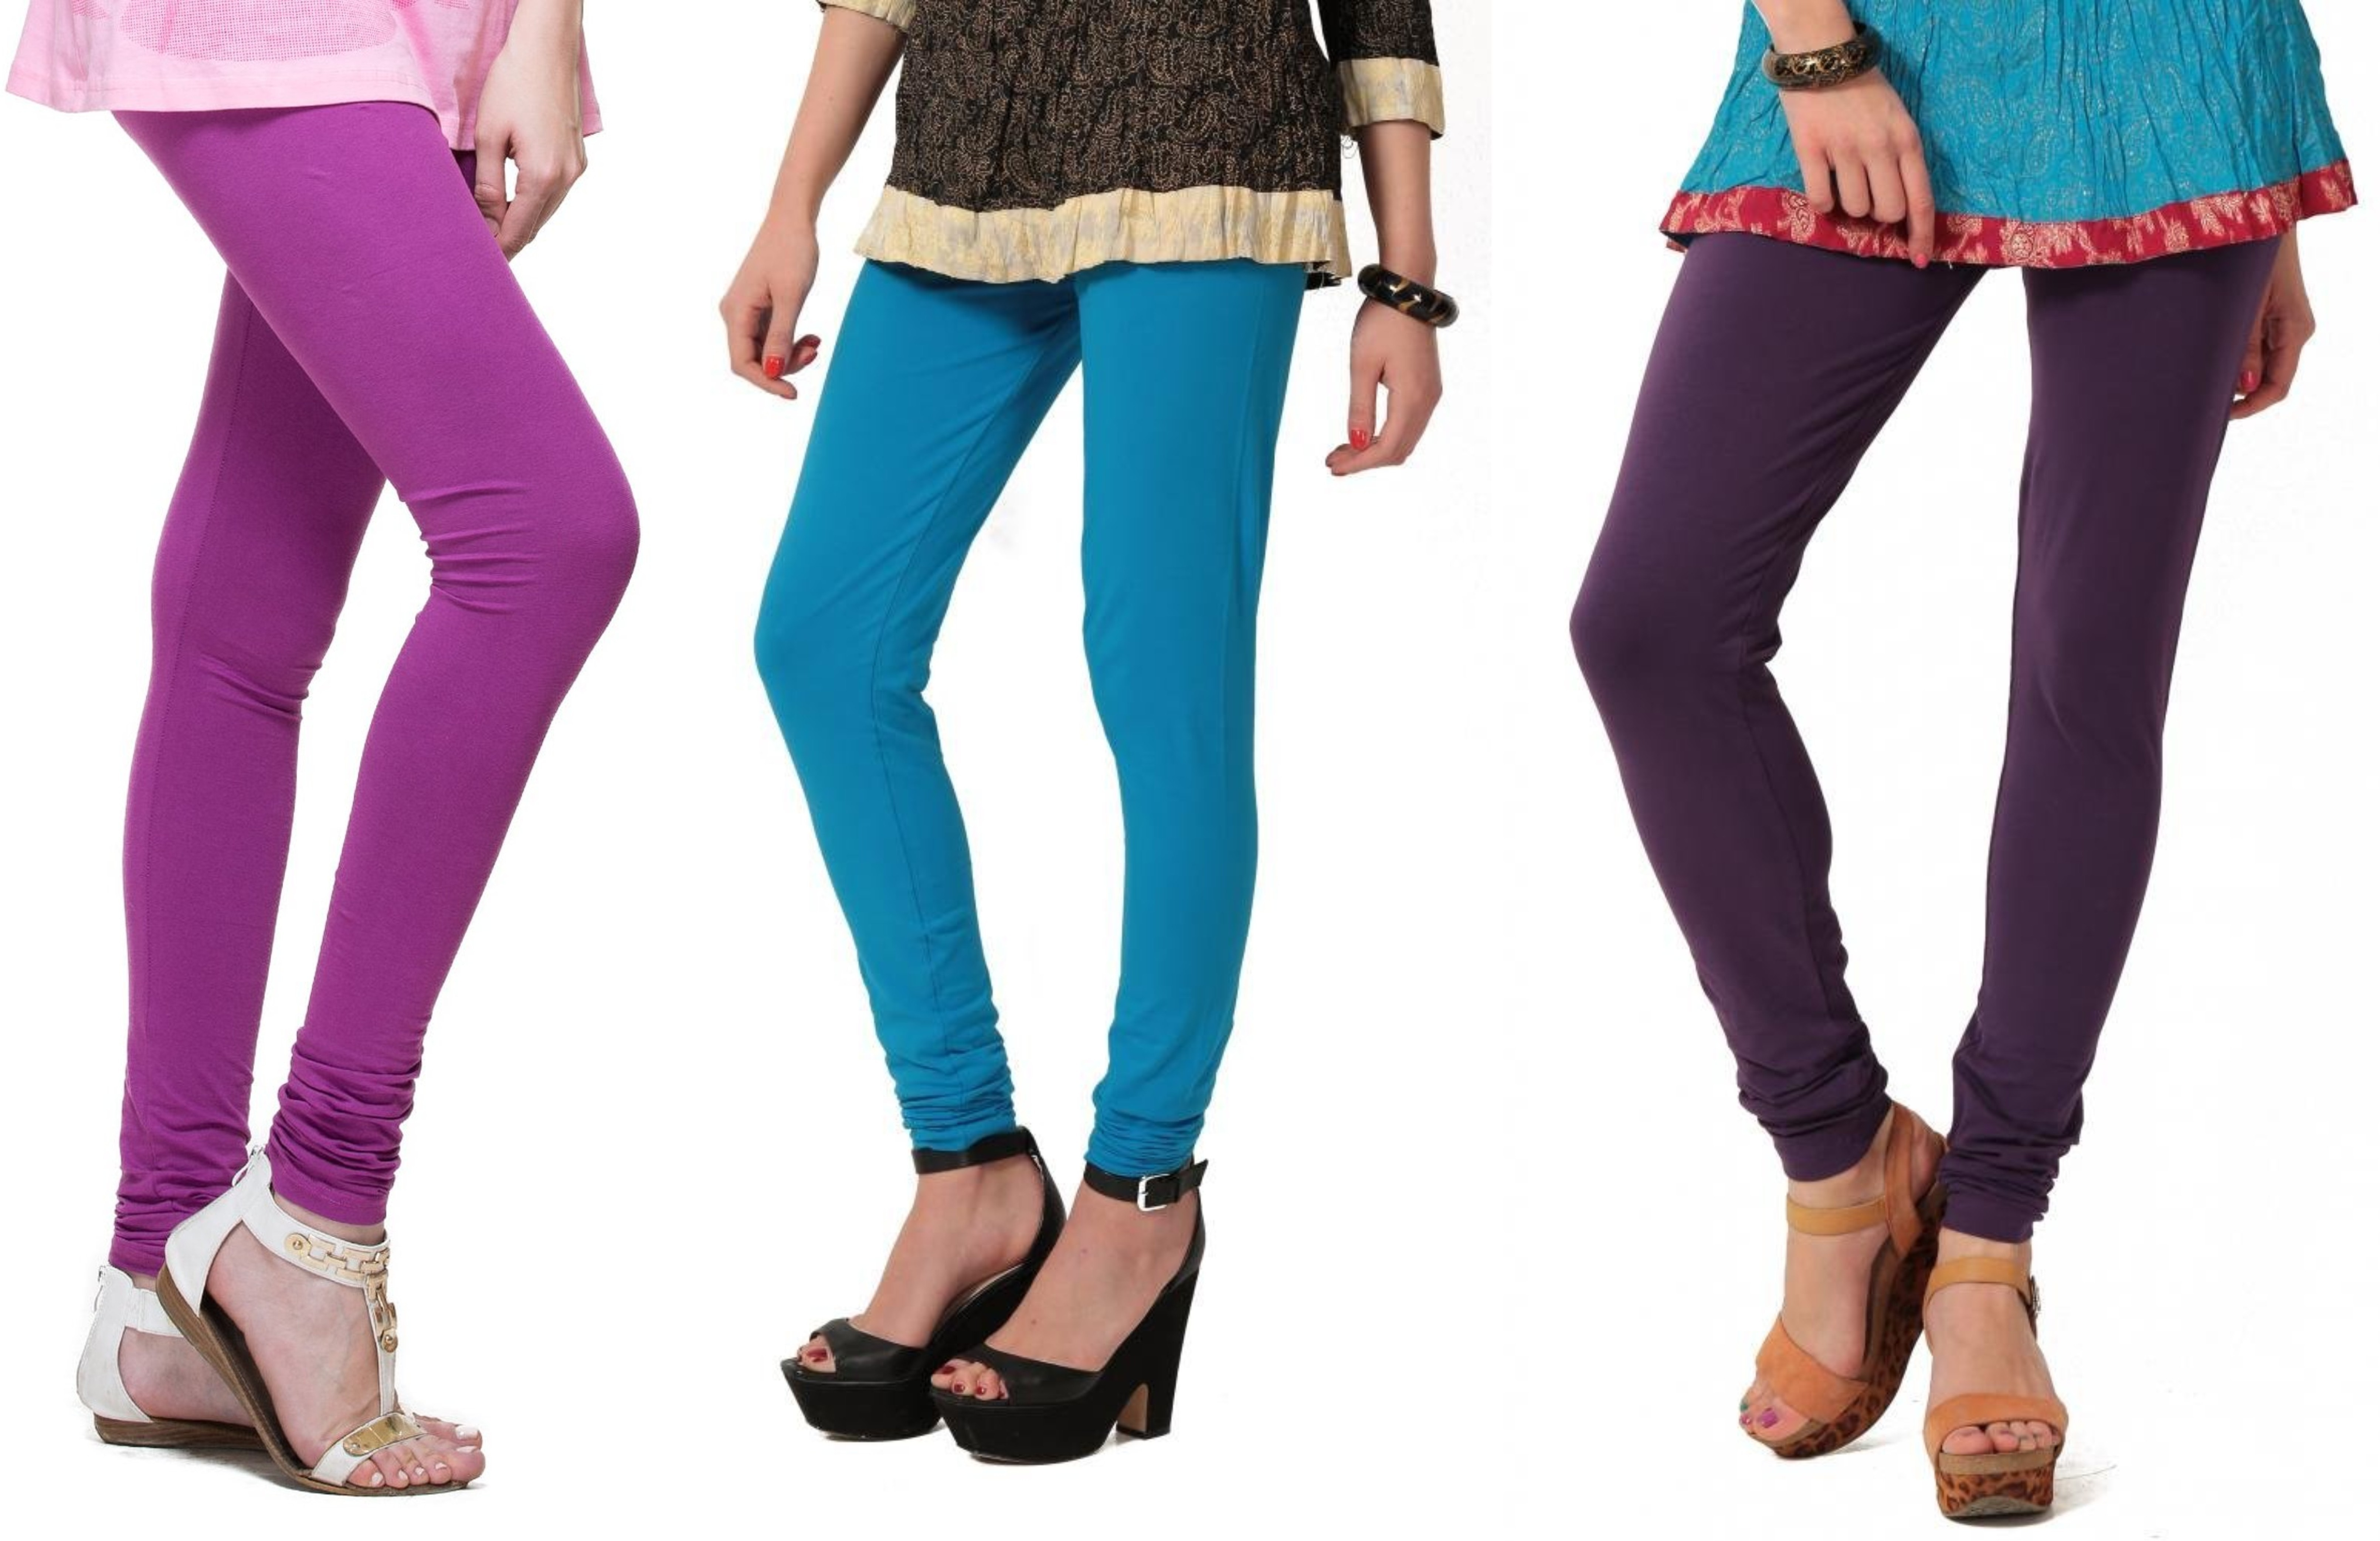 Angel Soft Womens Purple, Light Blue, Purple Leggings(Pack of 3)